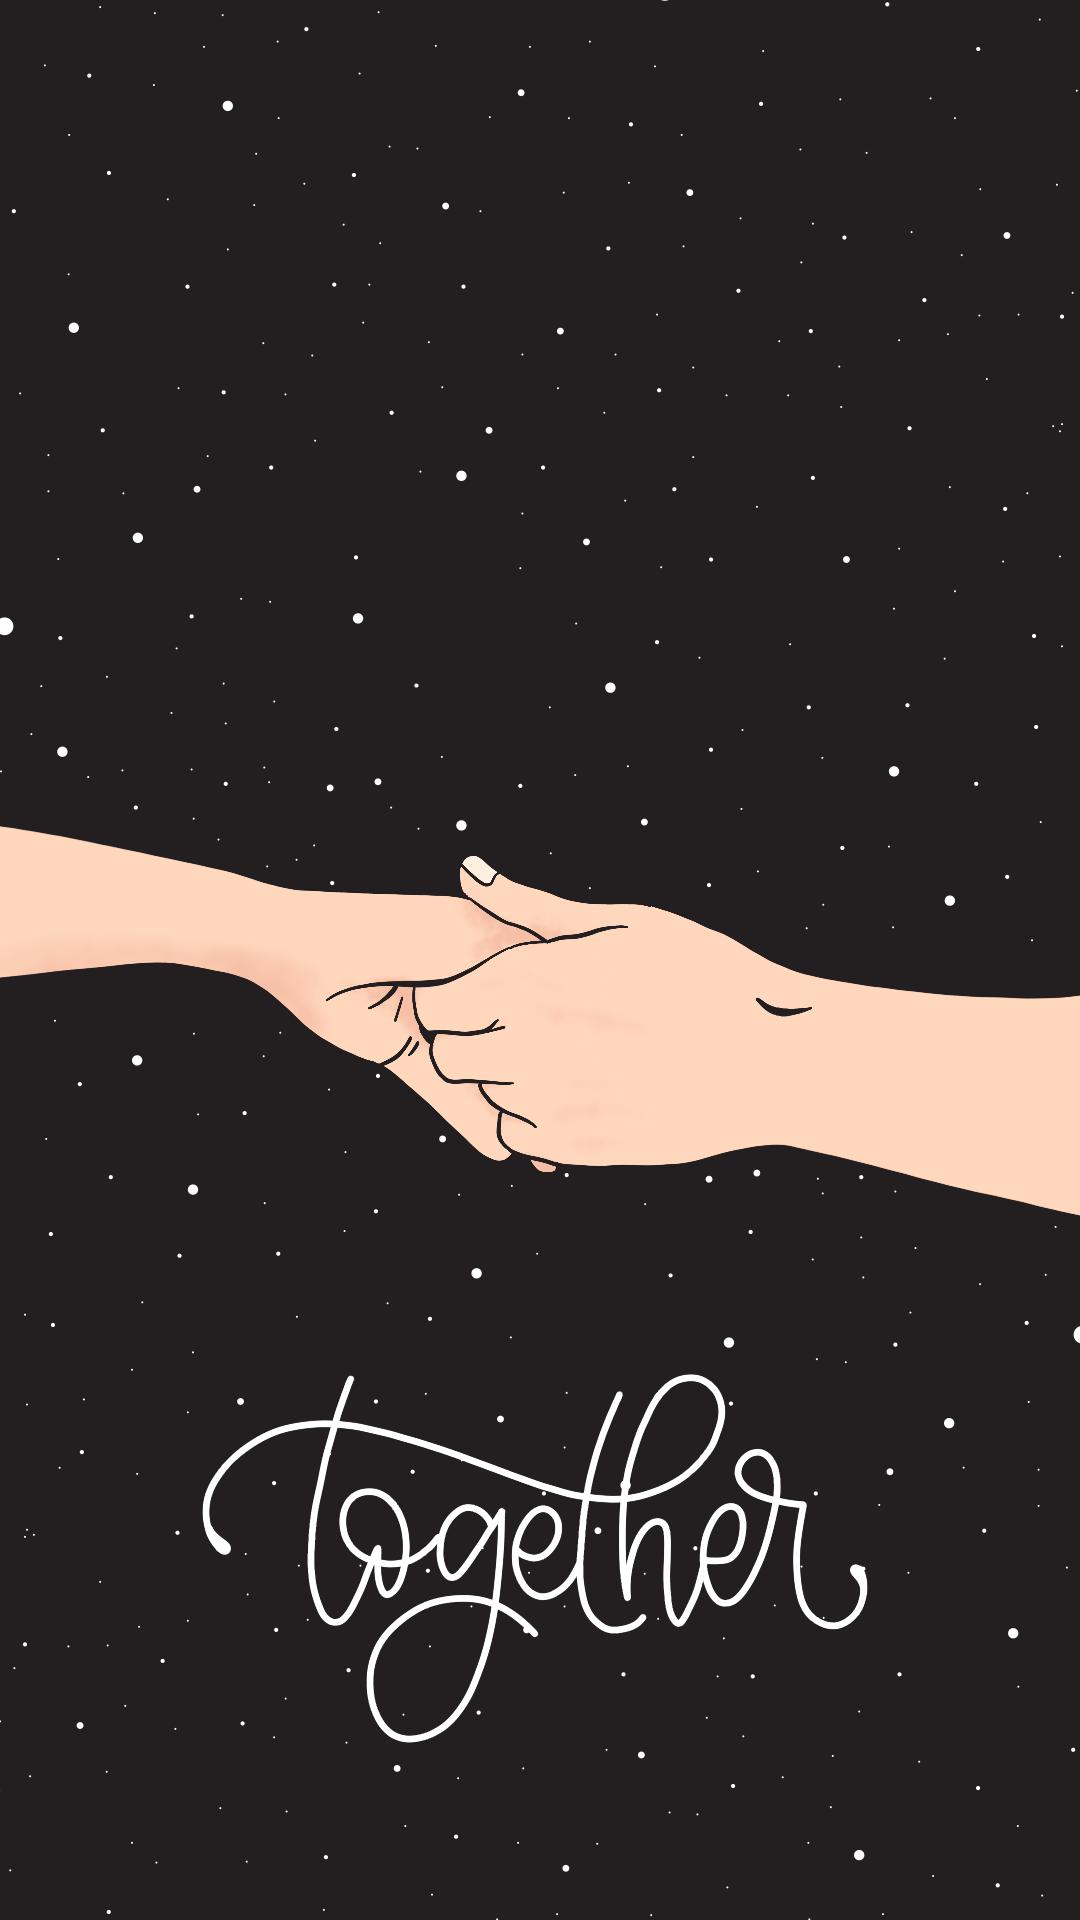 Wallpaper Mãos Dadas 1 by Gocase, hands, mãos, universo, universe, together, juntos, love, amor, couple, casal, namorado, namorada, girlfriend, boyfriend, girl, boy, menino, menina, cute, fofo, friendship, amizade, amigos, friends, união, united, wallpaper, fundo de tela, background, gocase, lovegocase, #gocase, #lovegocase, #fundodetela, #wallpaper, #background, #fundodetela, #universe, #universo, #hands, #mãos, #holdinghands